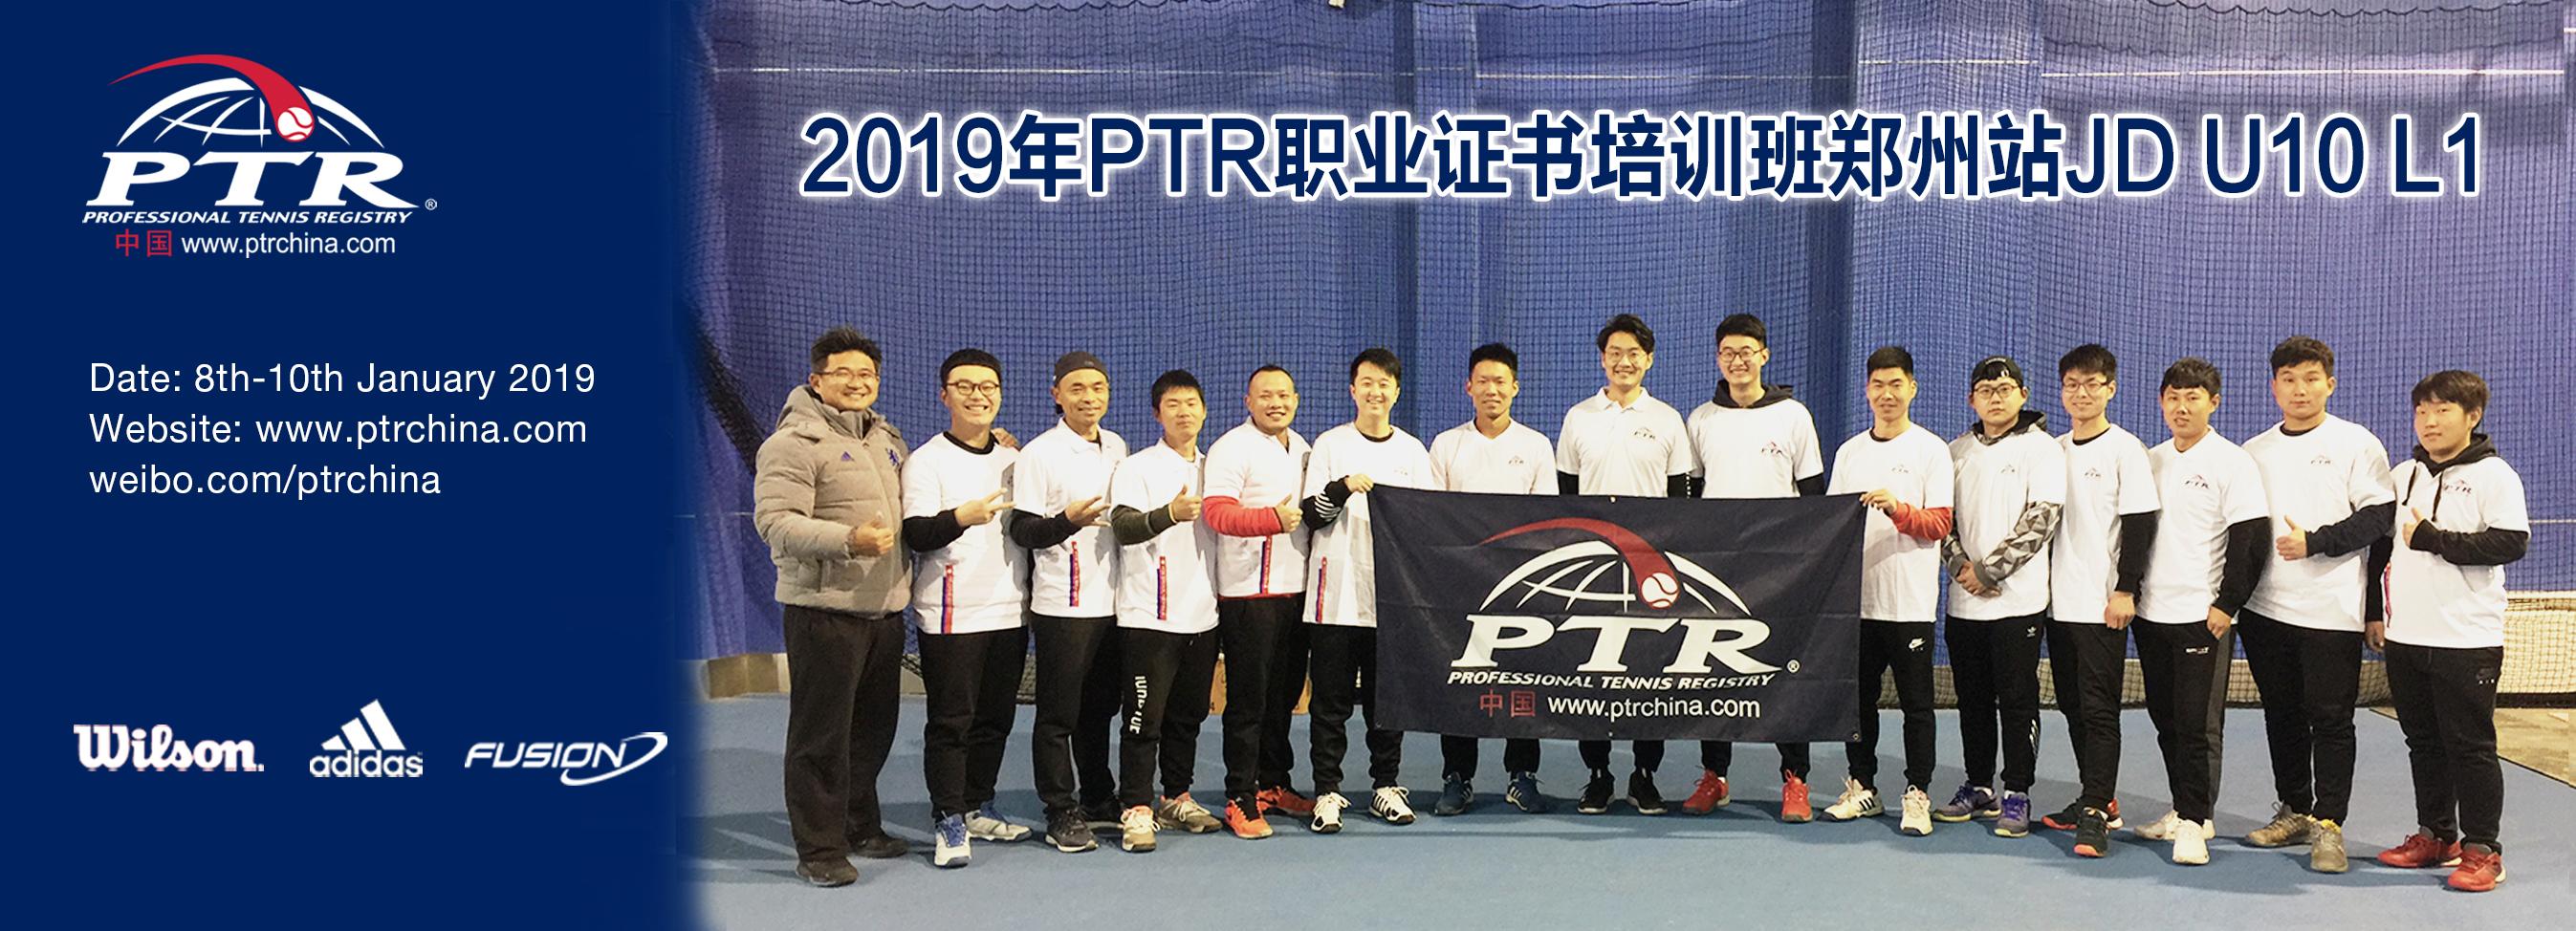 2019 PTR JD U10 L1 青少年发展培训郑州站圆满结业!